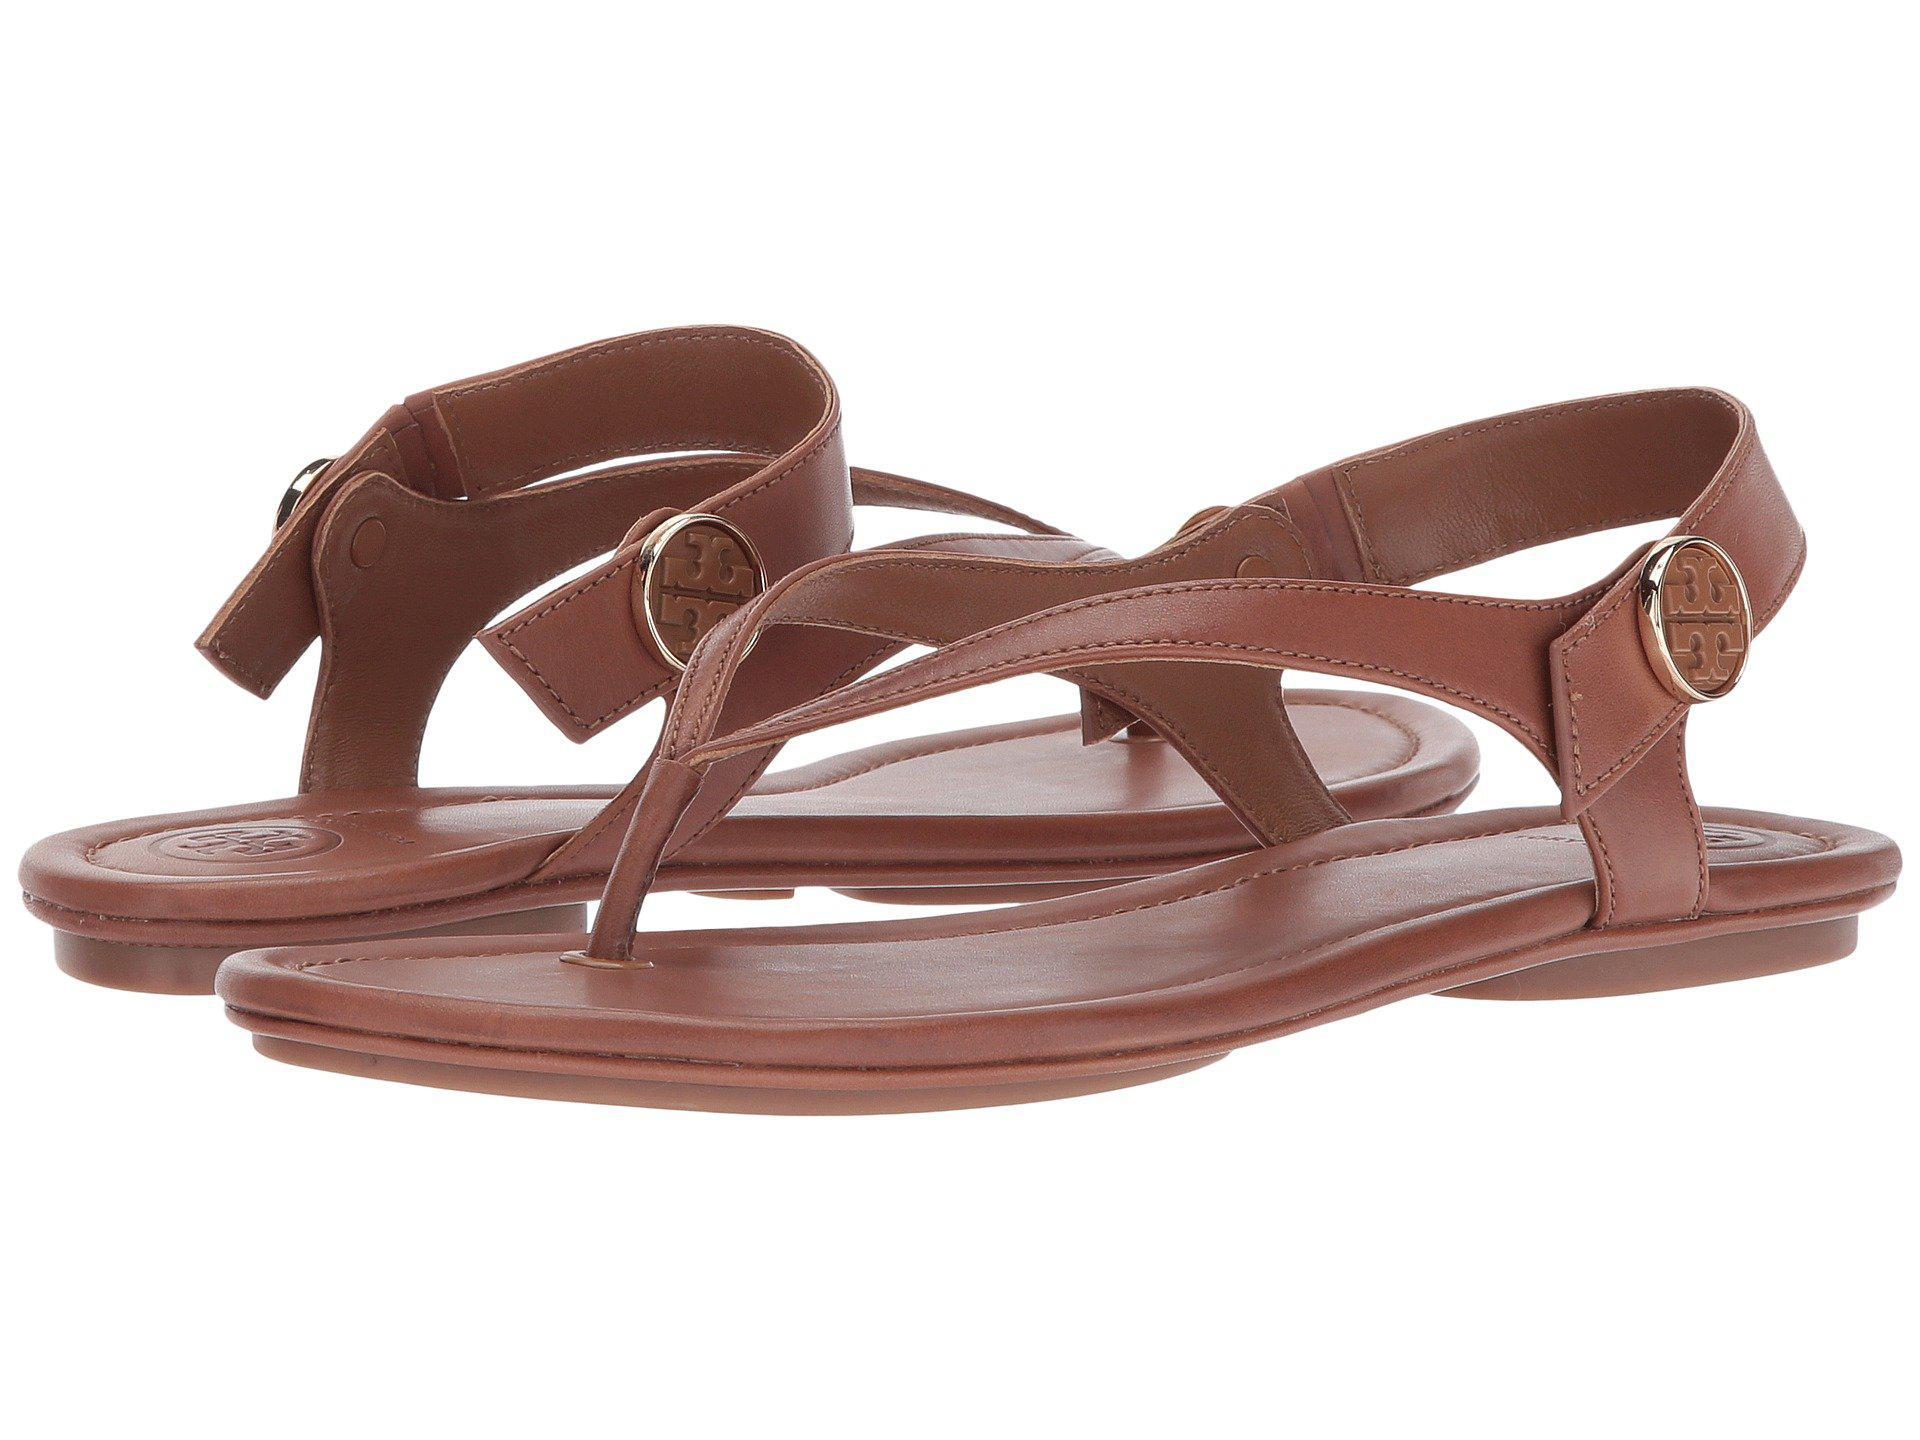 1281e9f159ab Lyst - Tory Burch Minnie Travel Sandal in Brown